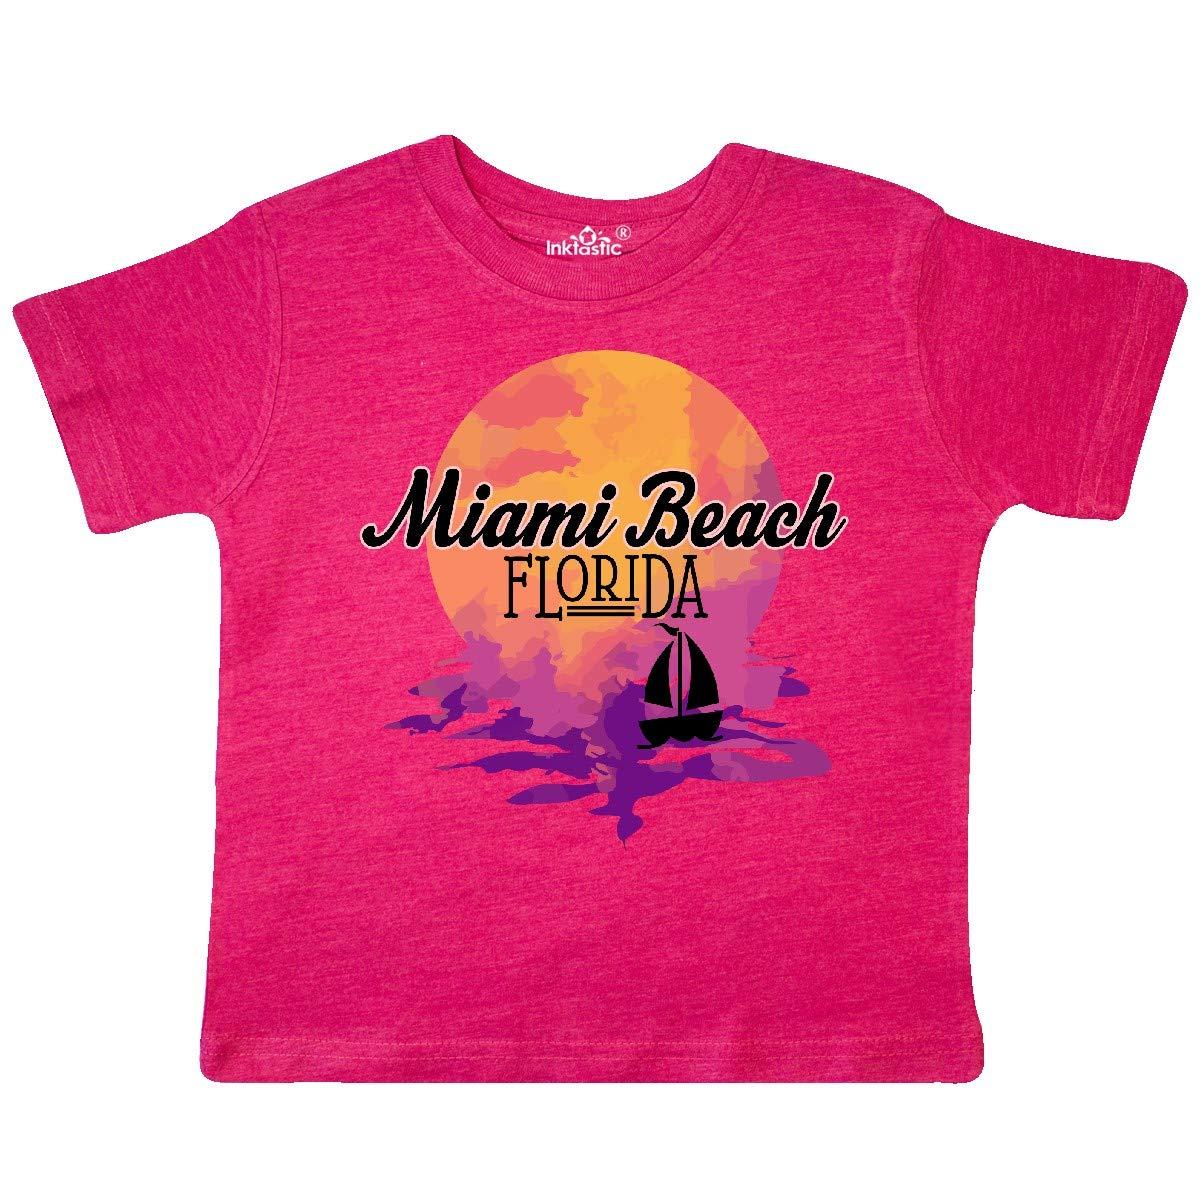 inktastic Miami Beach Florida Vacation Sunset Toddler T-Shirt